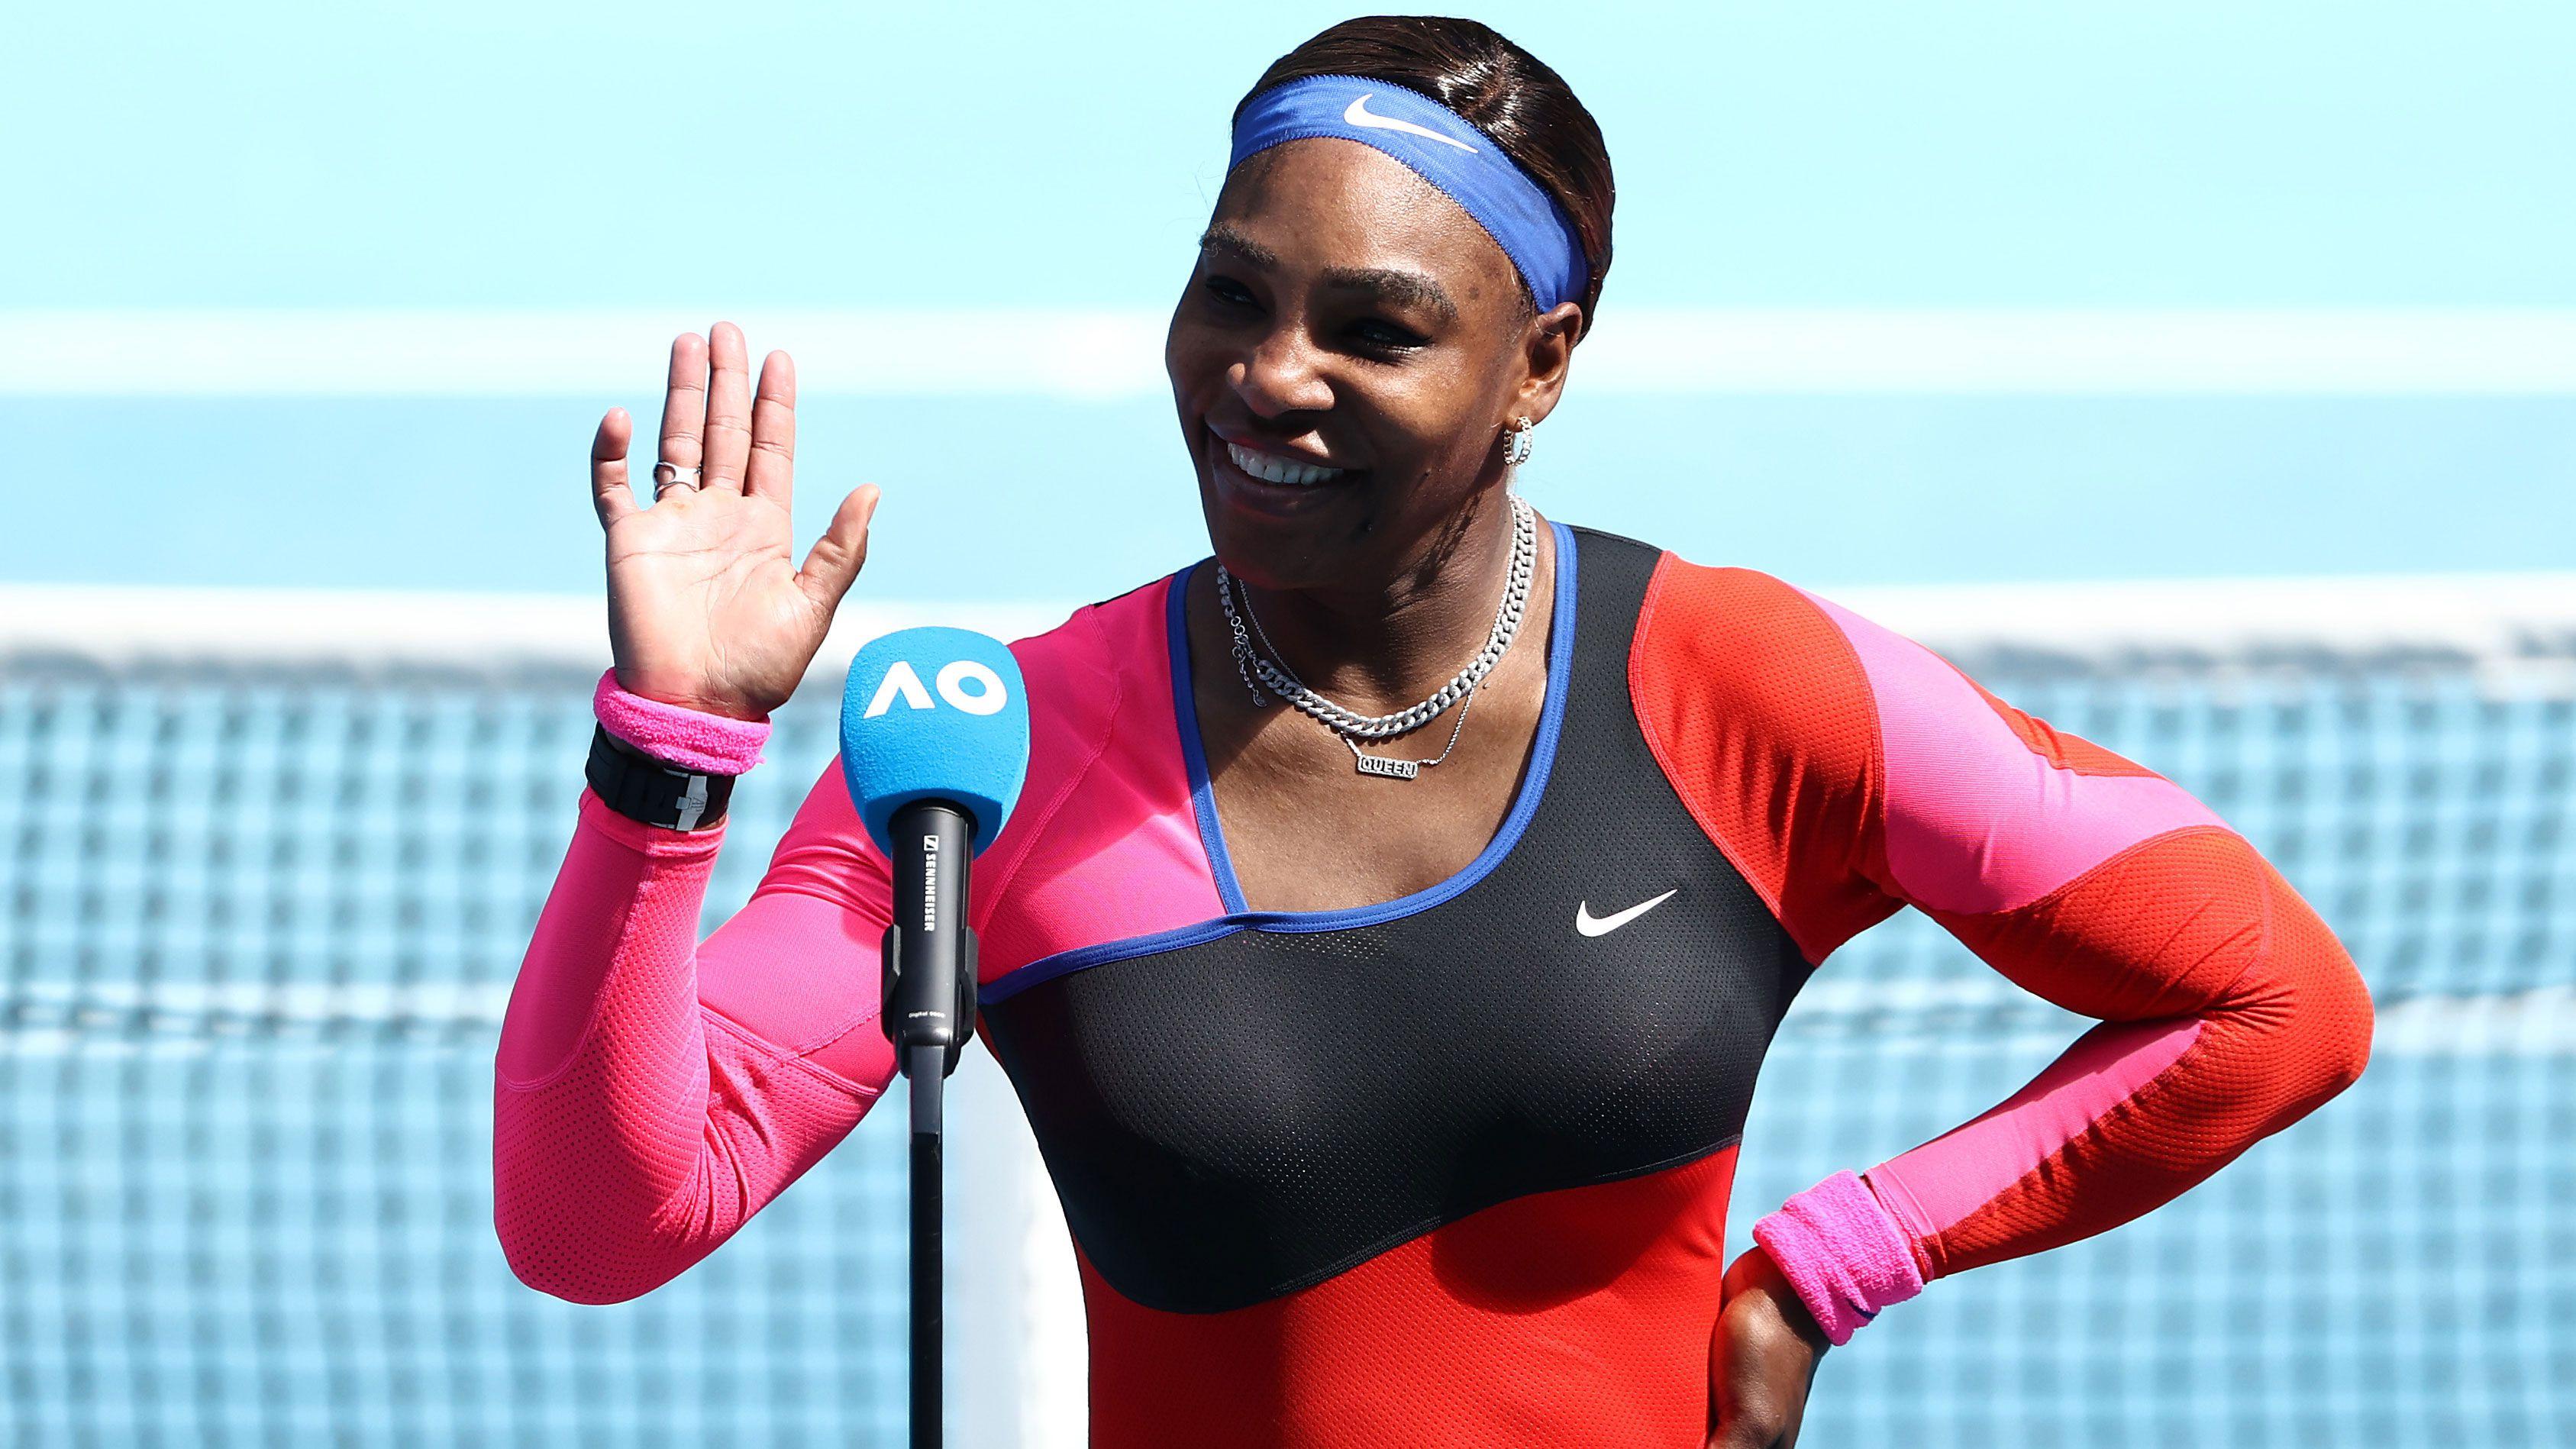 Serena Williams in her on-court interview after winning her Australian Open fourth round match.